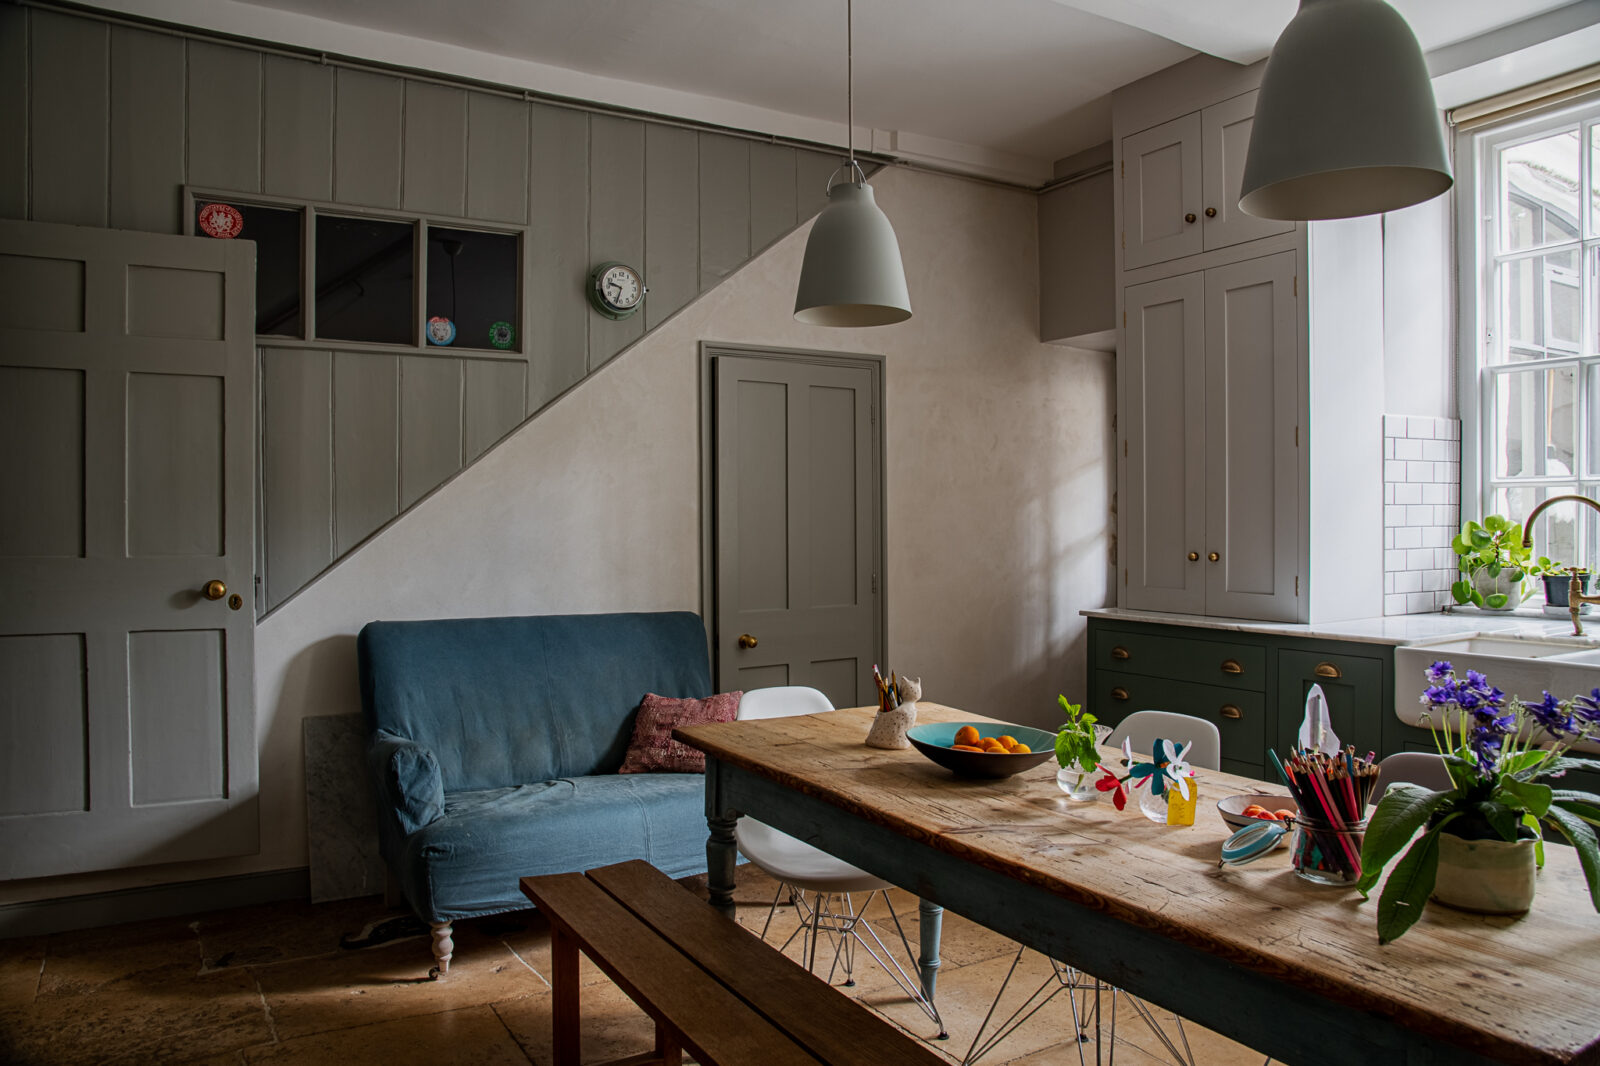 Heritage shades in the kitchen still feel modern